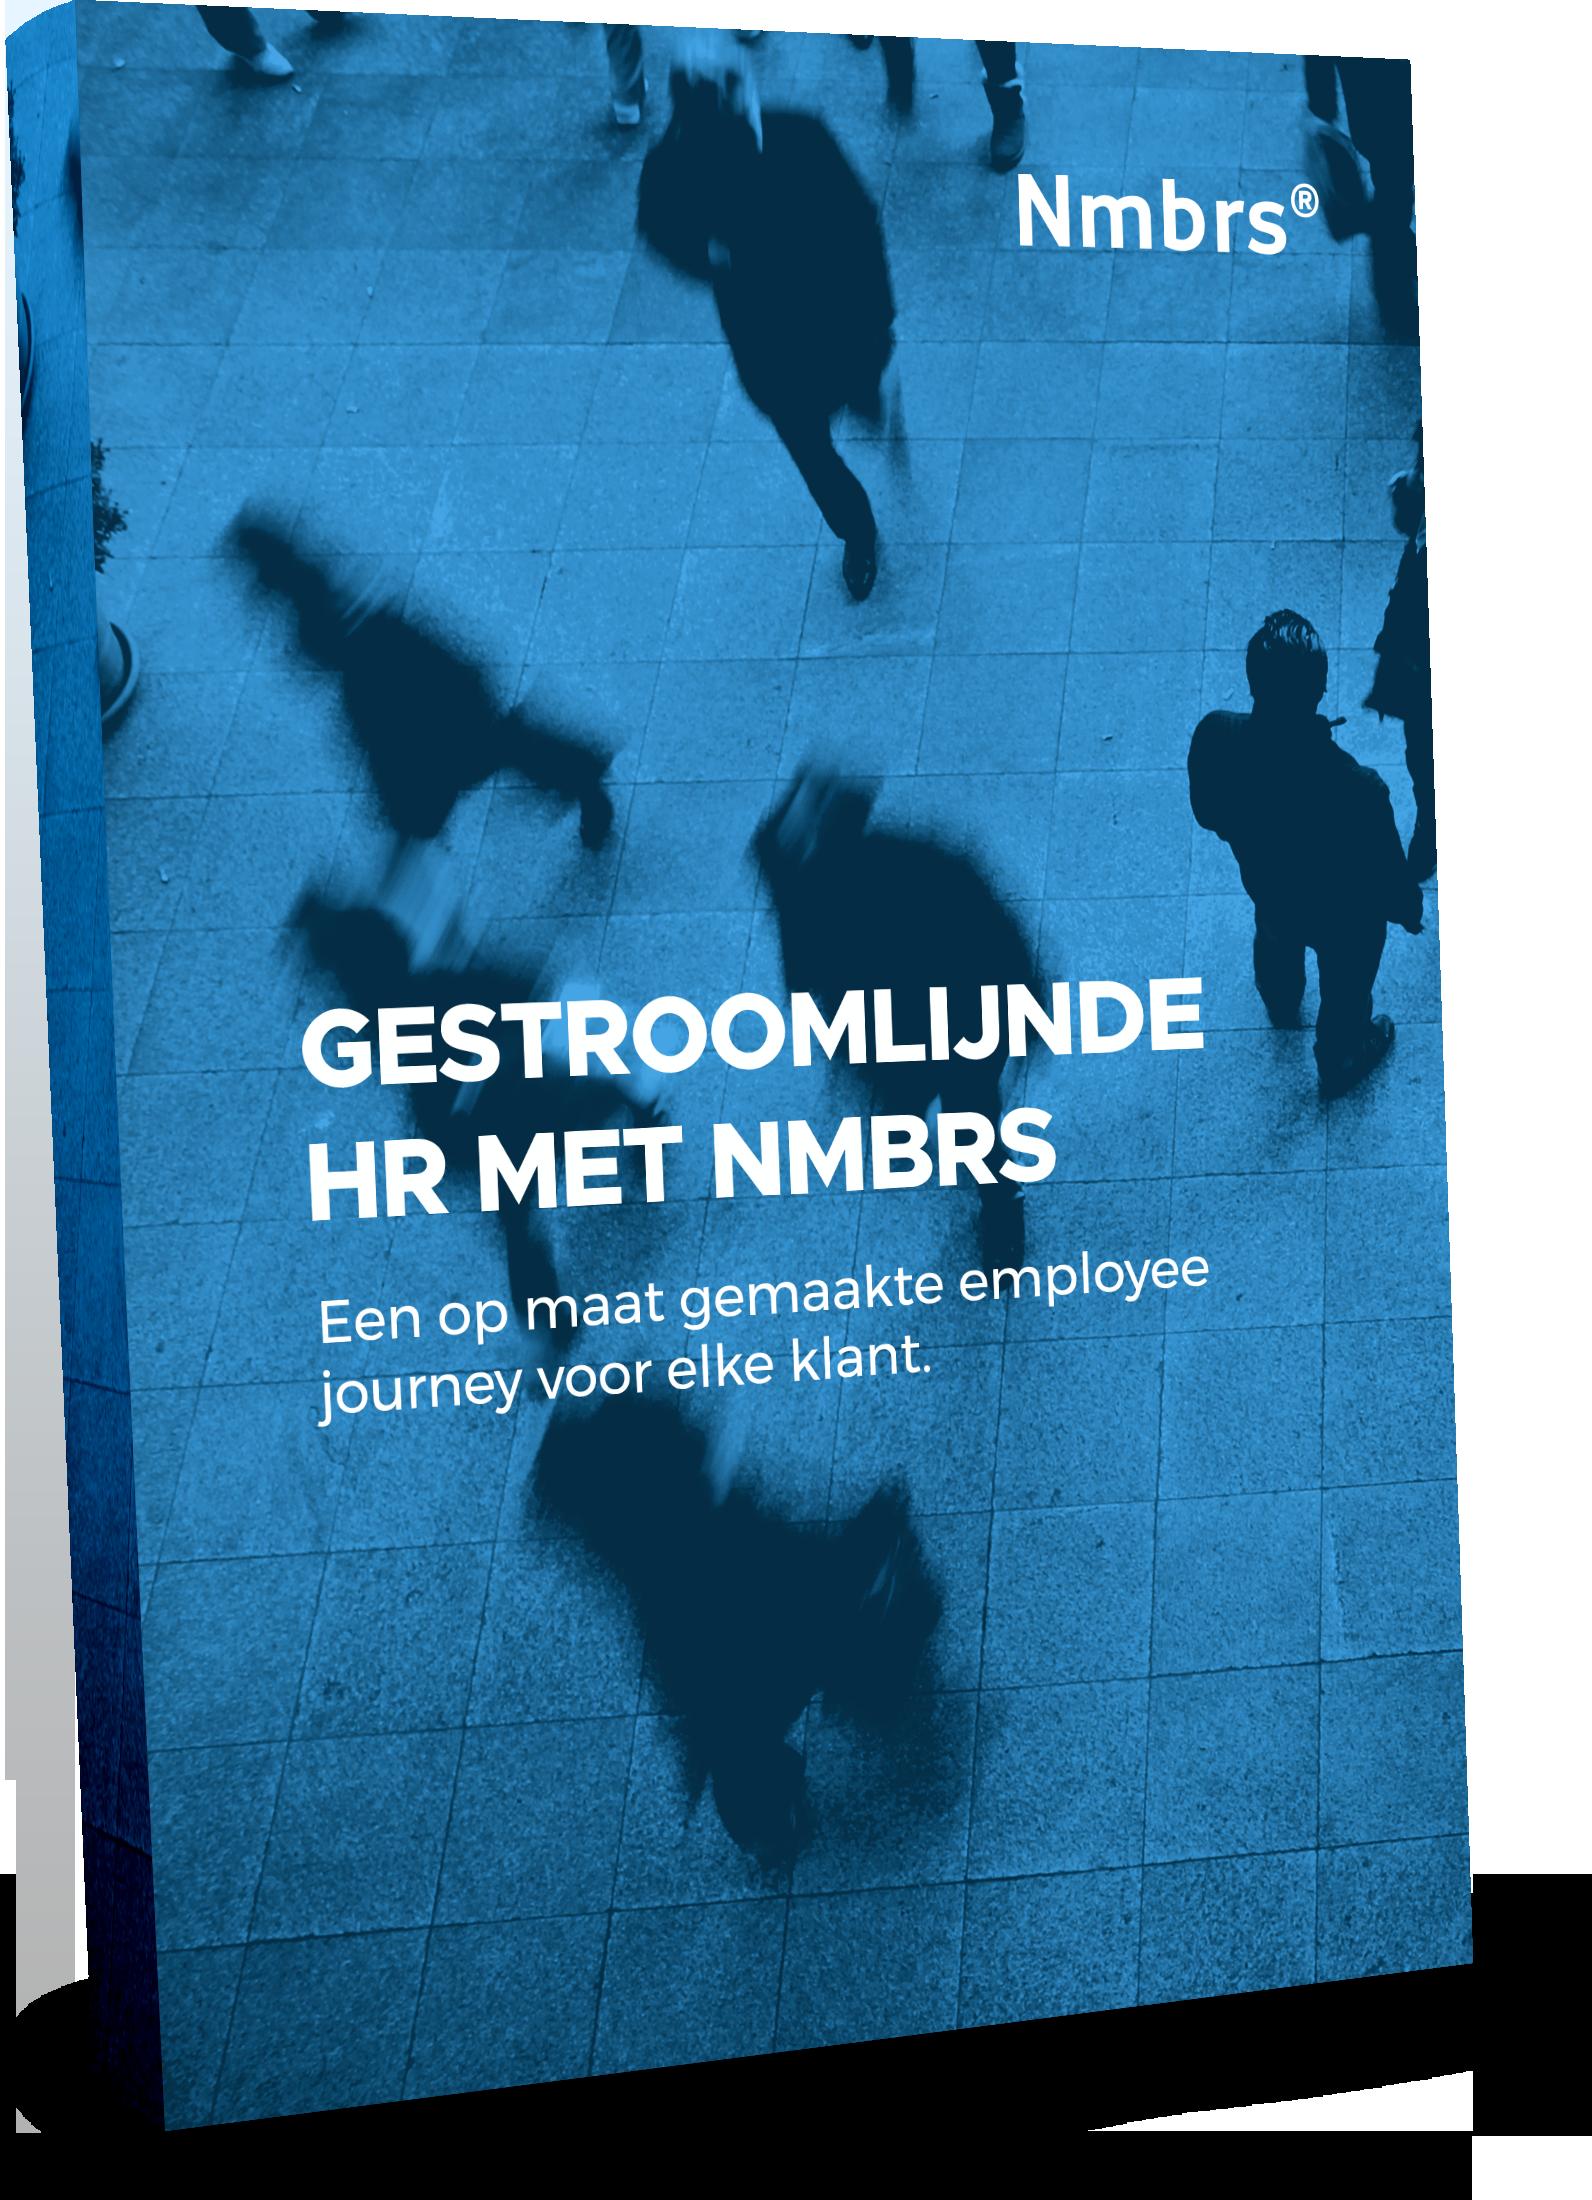 nmbrs-whitepaper-GestroomlijndeHRmetNmbrs-book-banner (1)